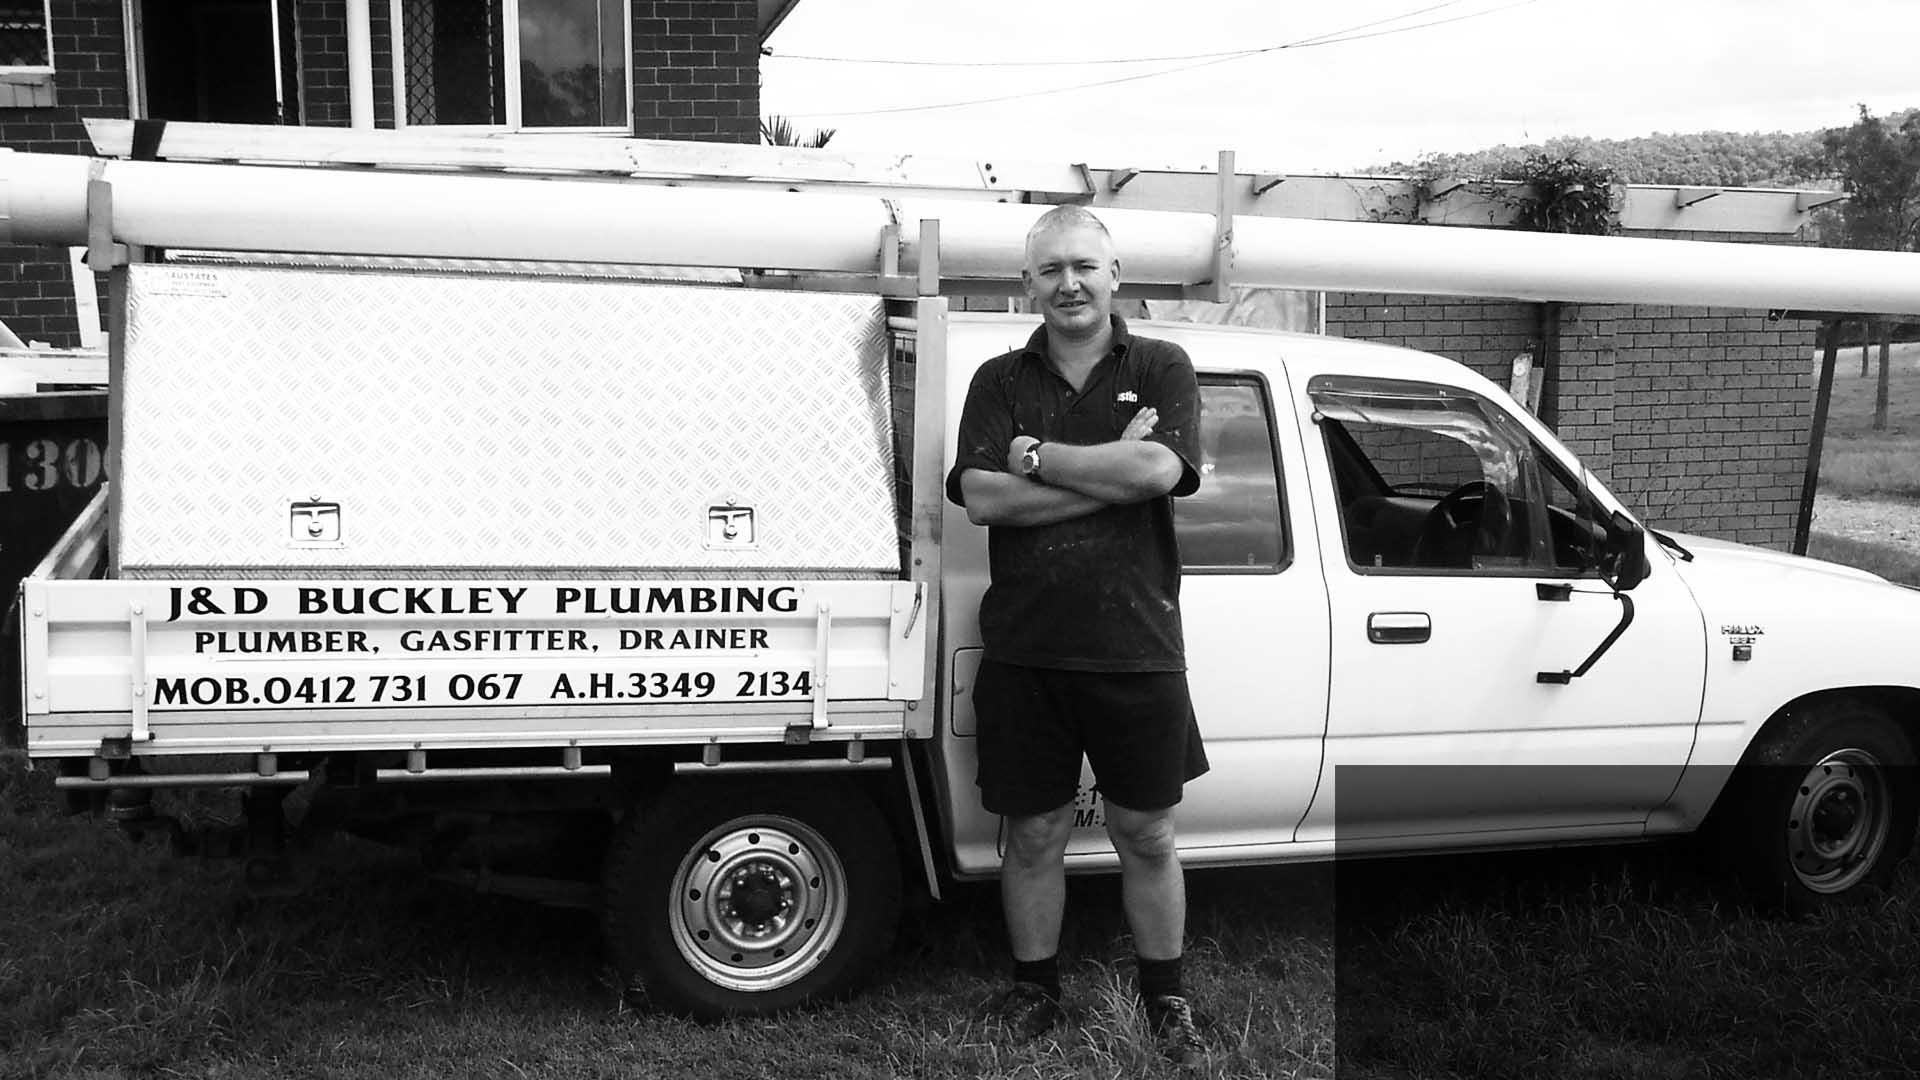 jandd-buckley-plumbing